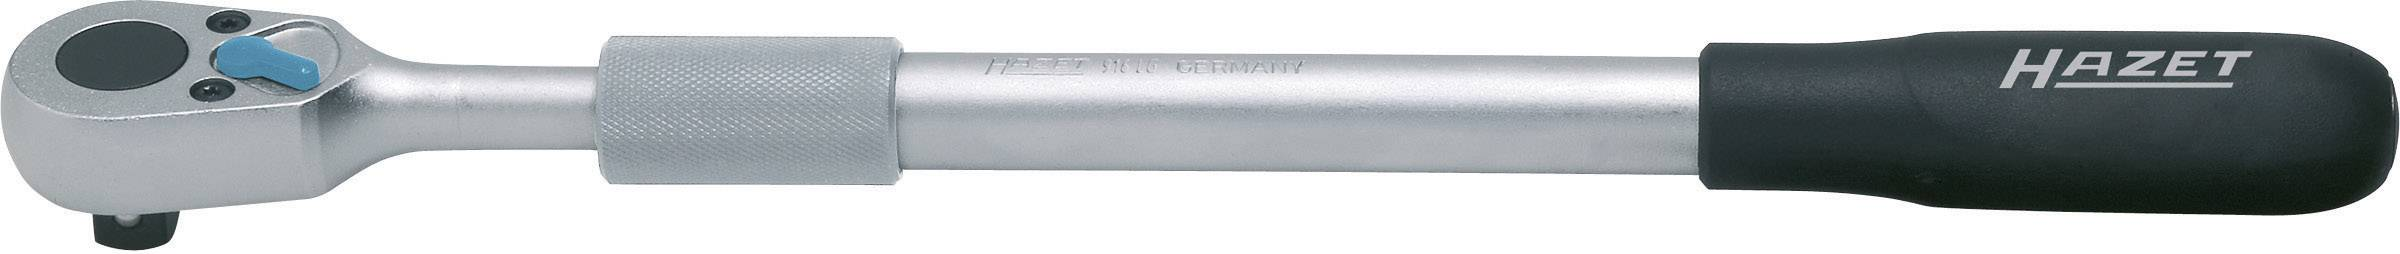 "Račňa Hazet 916LG, 1/2"" (12.5 mm), 12,5 mm (1/2""), 410 mm"